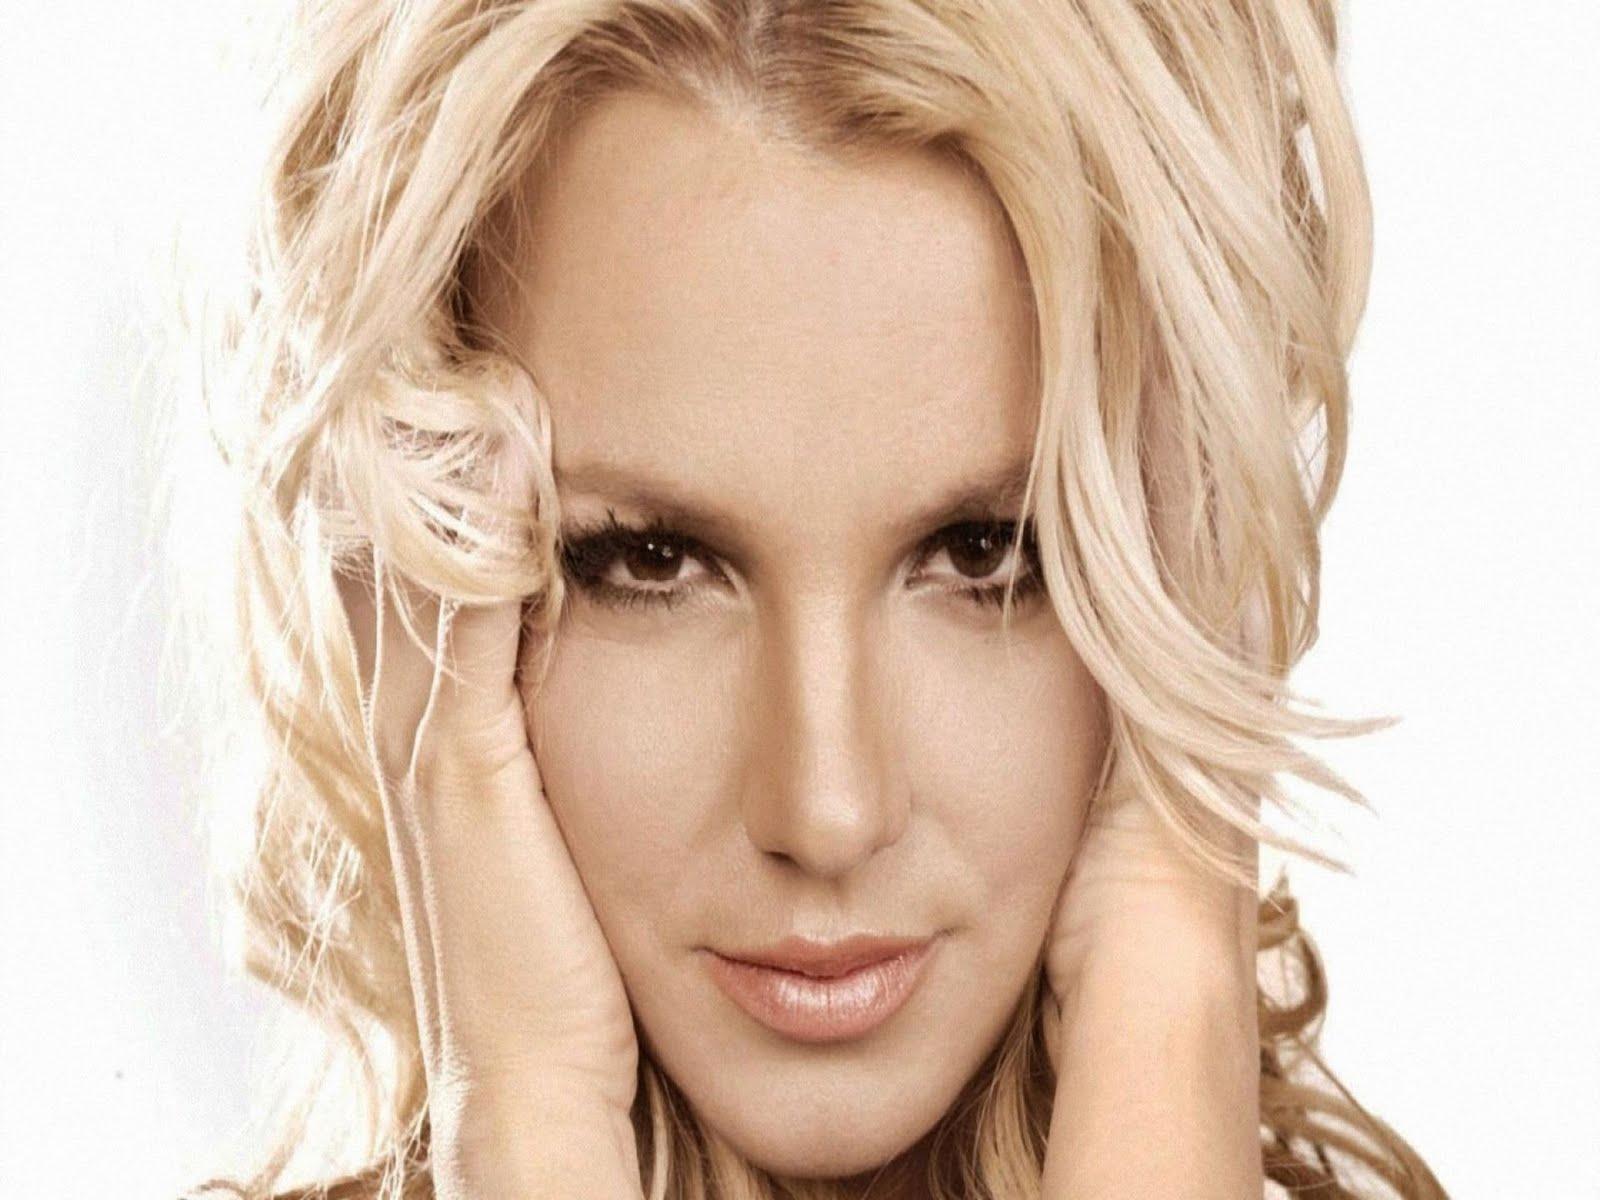 http://3.bp.blogspot.com/-c_lW_K2mQdk/TmJRYW6vBRI/AAAAAAAACfM/Ltso0vmC9lY/s1600/Britney%252BSpears%252B2011%252BWallpaper%252B10.jpg